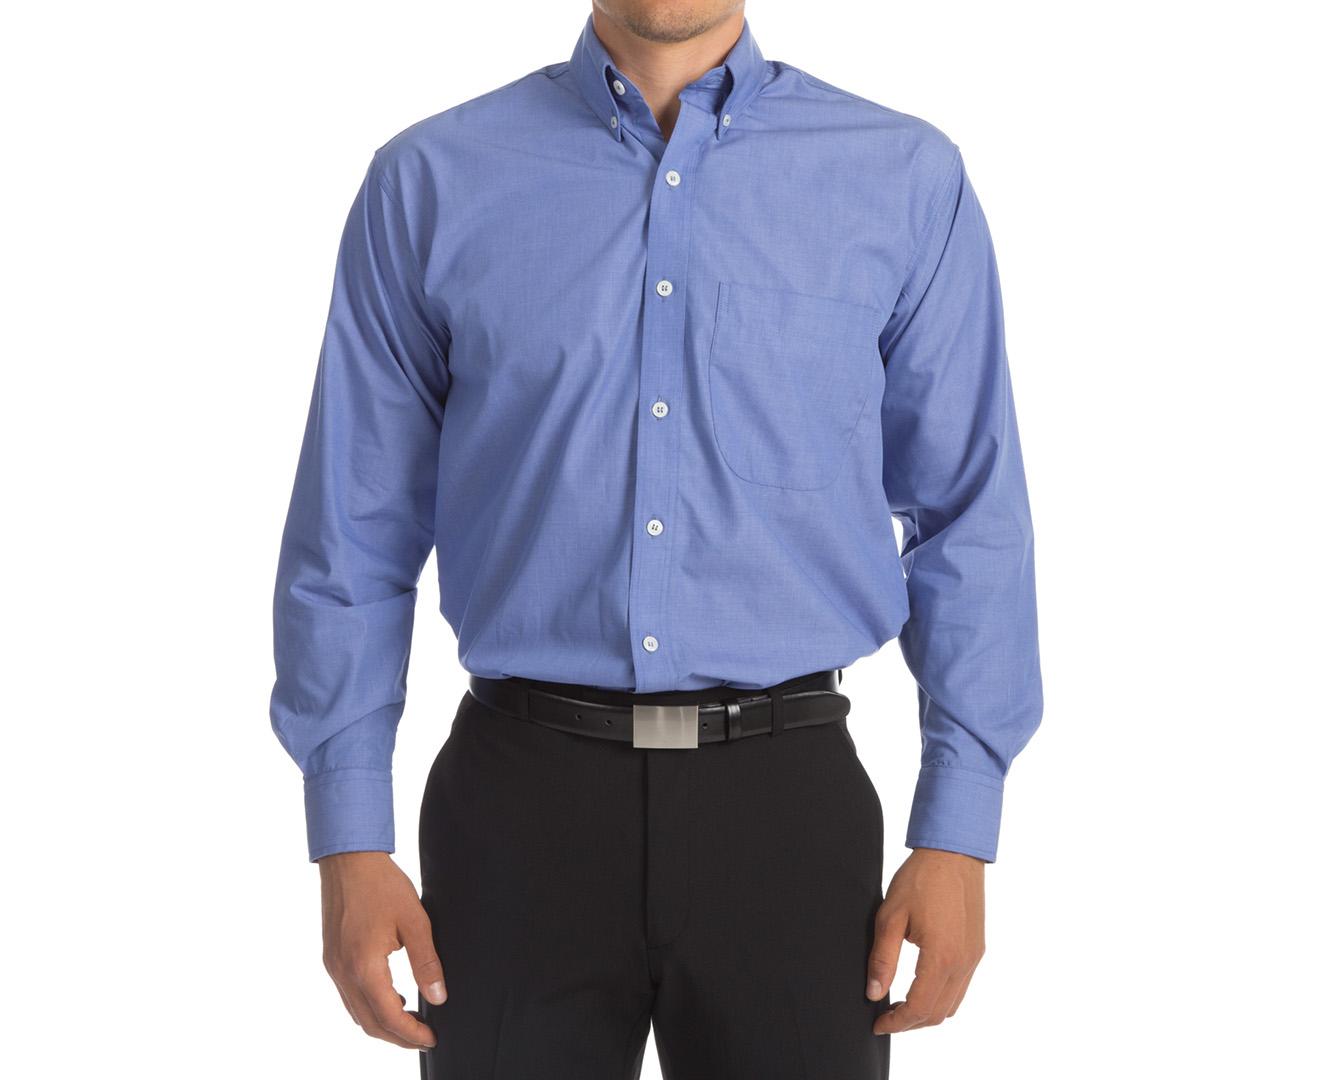 Nnt Men 39 S Long Sleeve Full Cutaway Collar Shirt Mid Blue